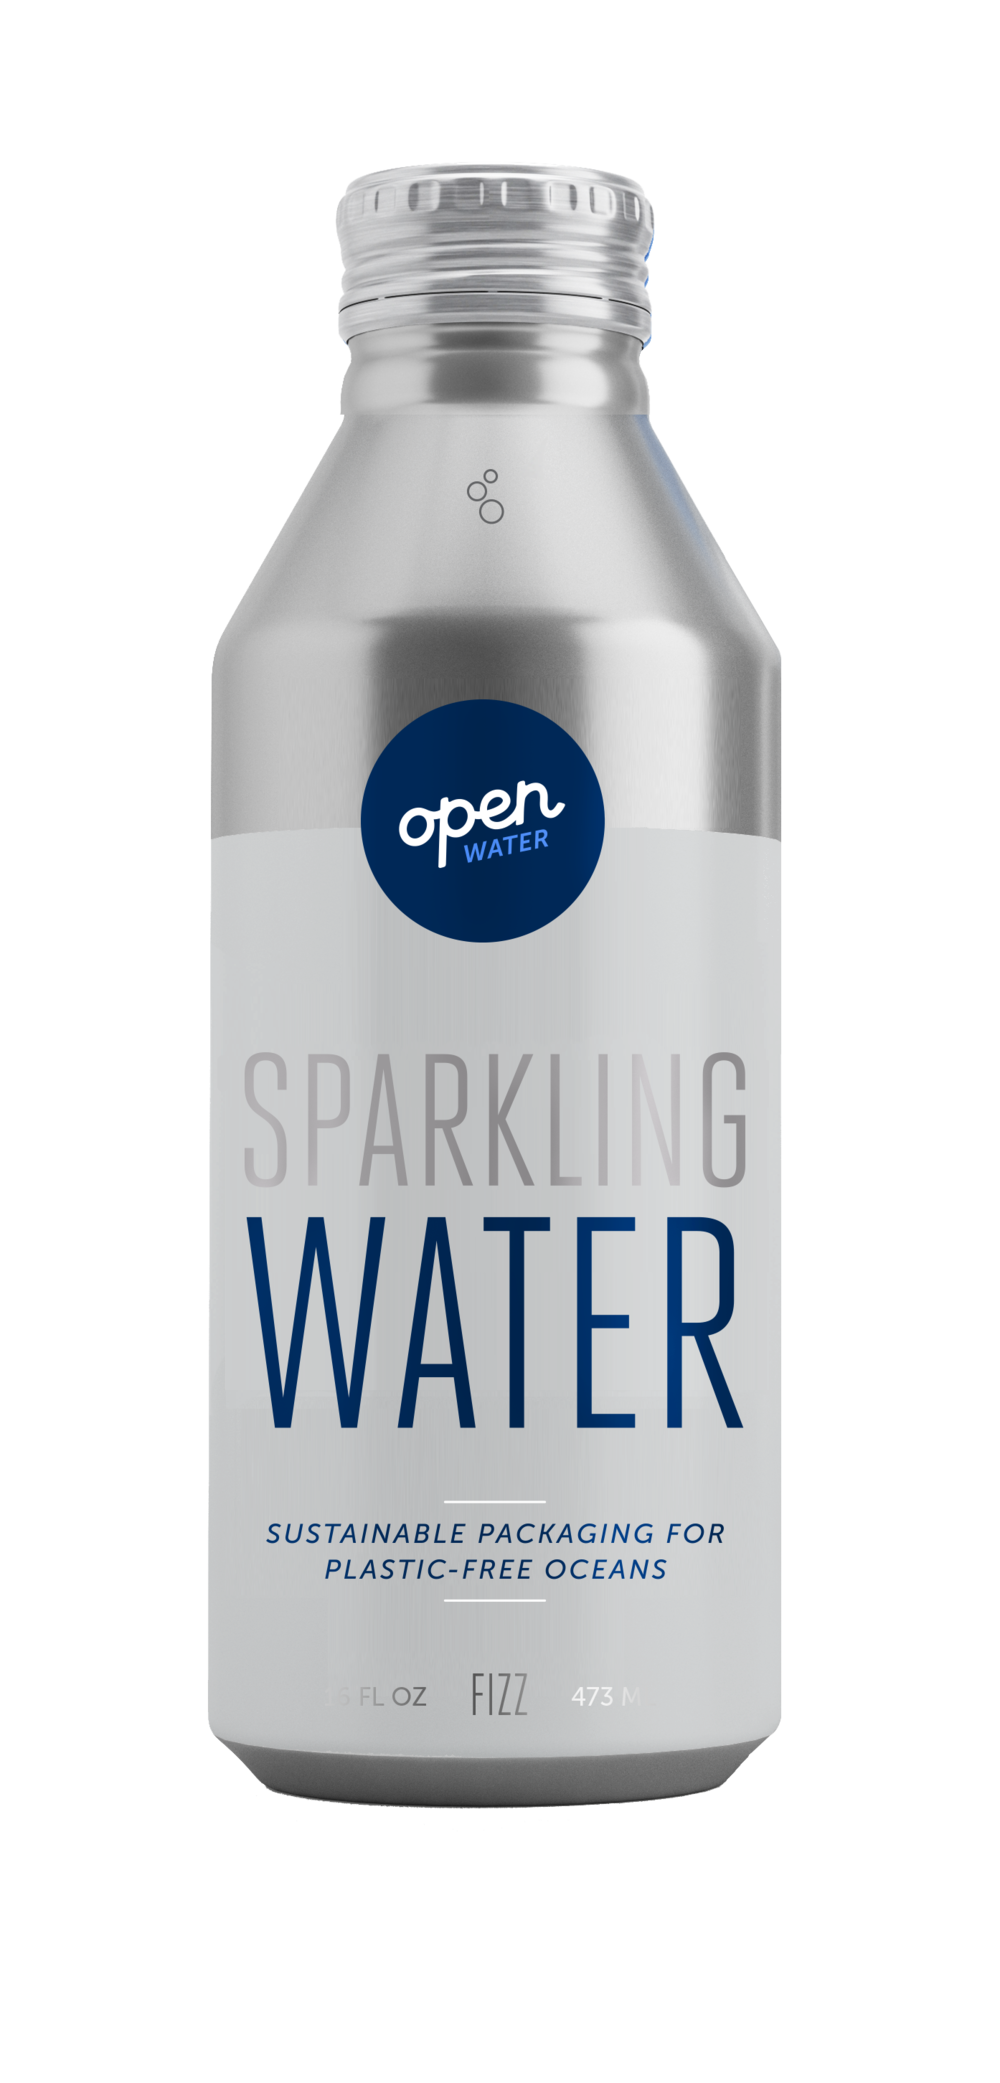 Open Water Sparkling Water in aluminum bottle